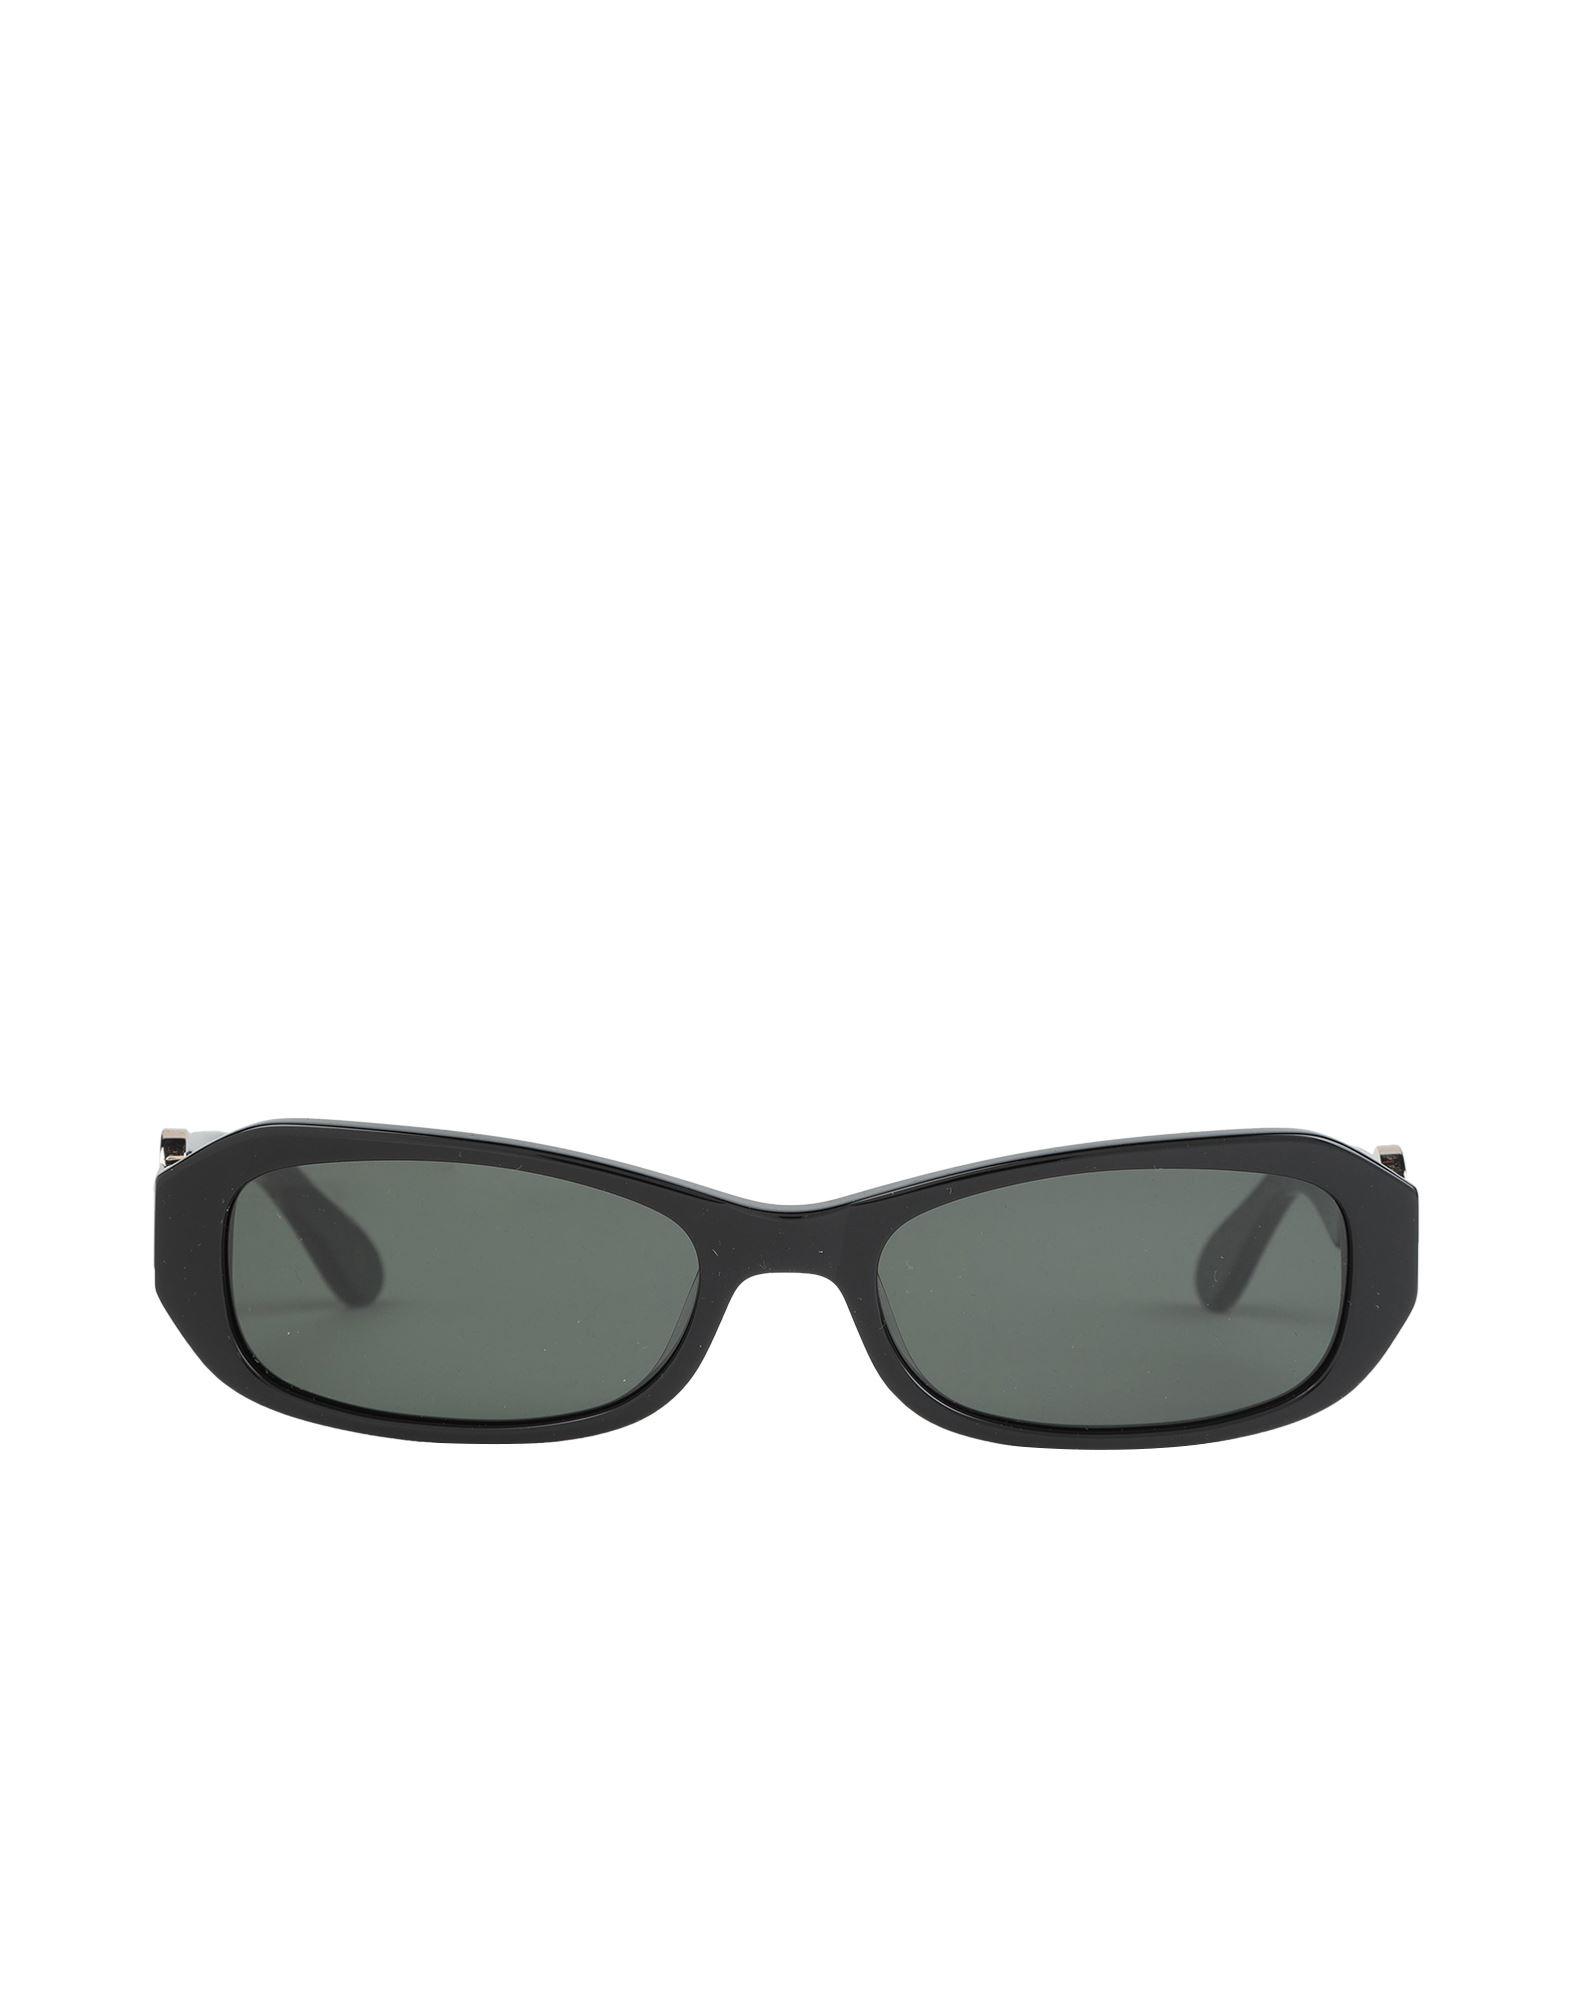 HAN KJØBENHAVN Sunglasses - Item 46737538